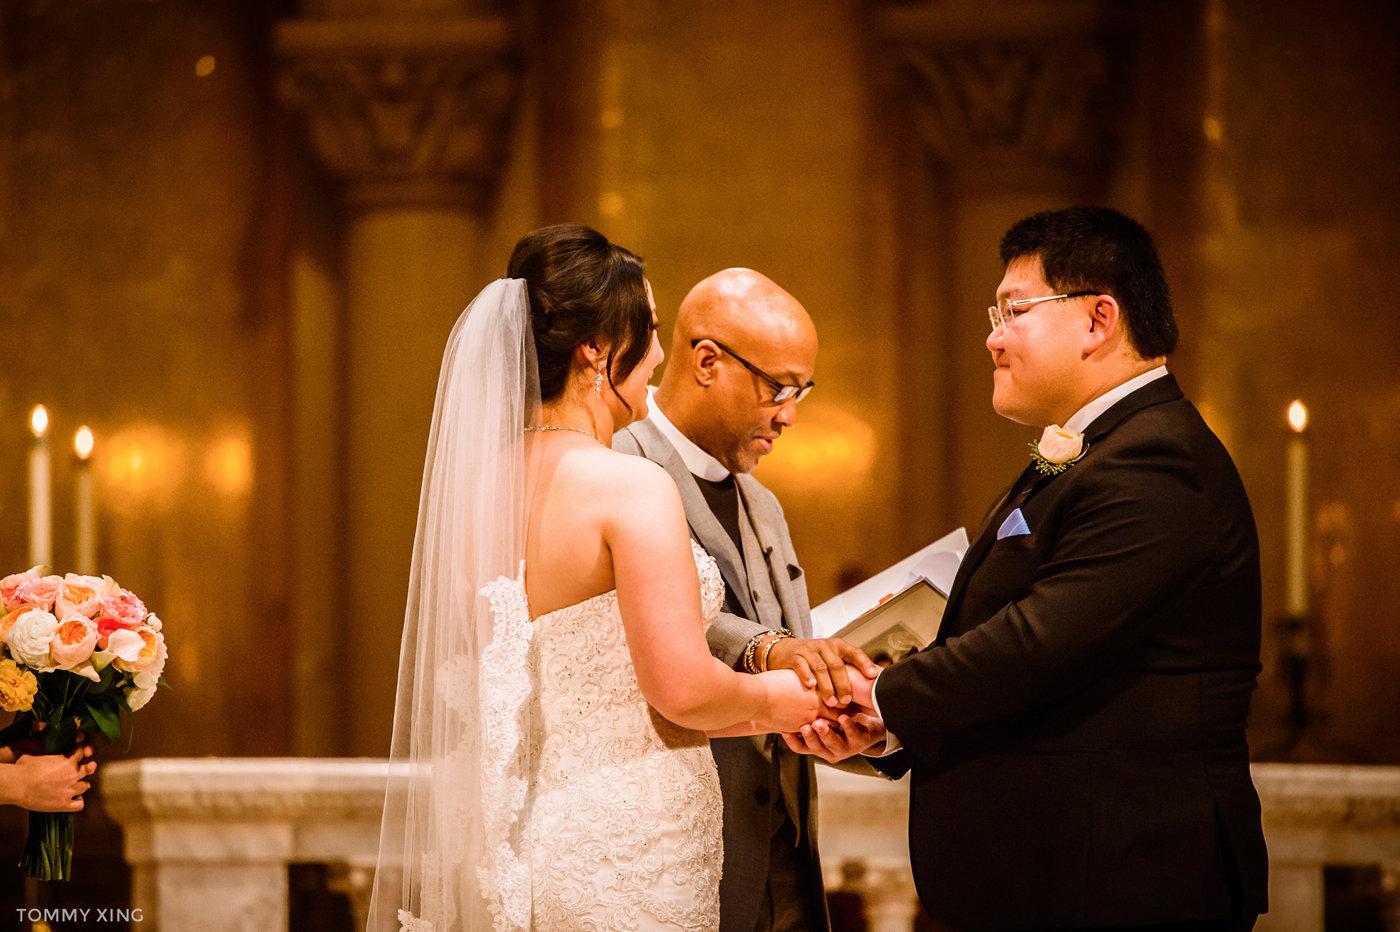 STANFORD MEMORIAL CHURCH WEDDING - Wenjie & Chengcheng - SAN FRANCISCO BAY AREA 斯坦福教堂婚礼跟拍 - 洛杉矶婚礼婚纱照摄影师 Tommy Xing Photography104.jpg